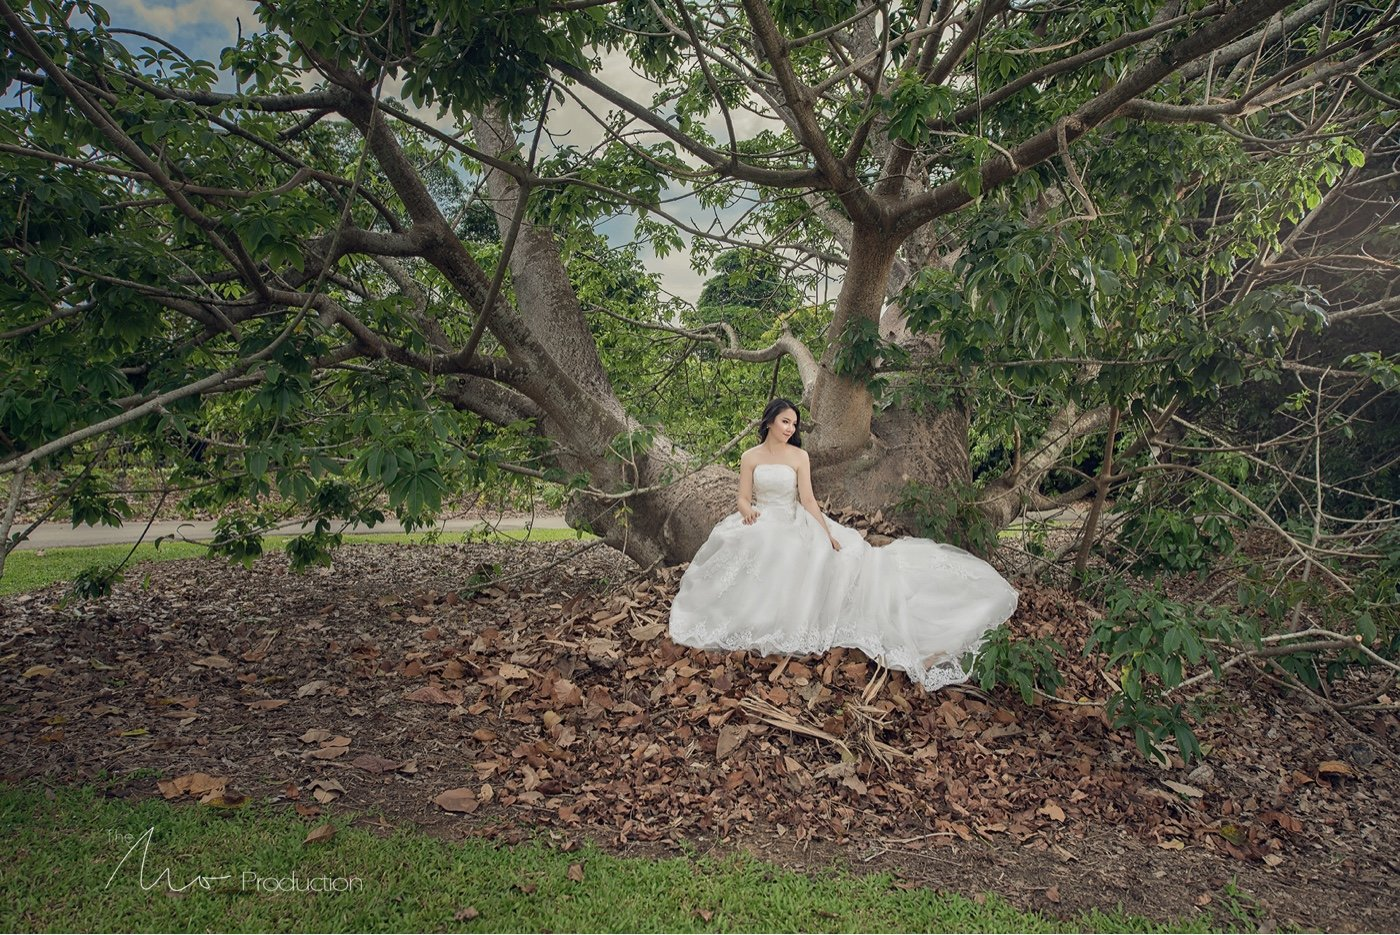 MoFoTo 旅拍婚纱 新加坡10